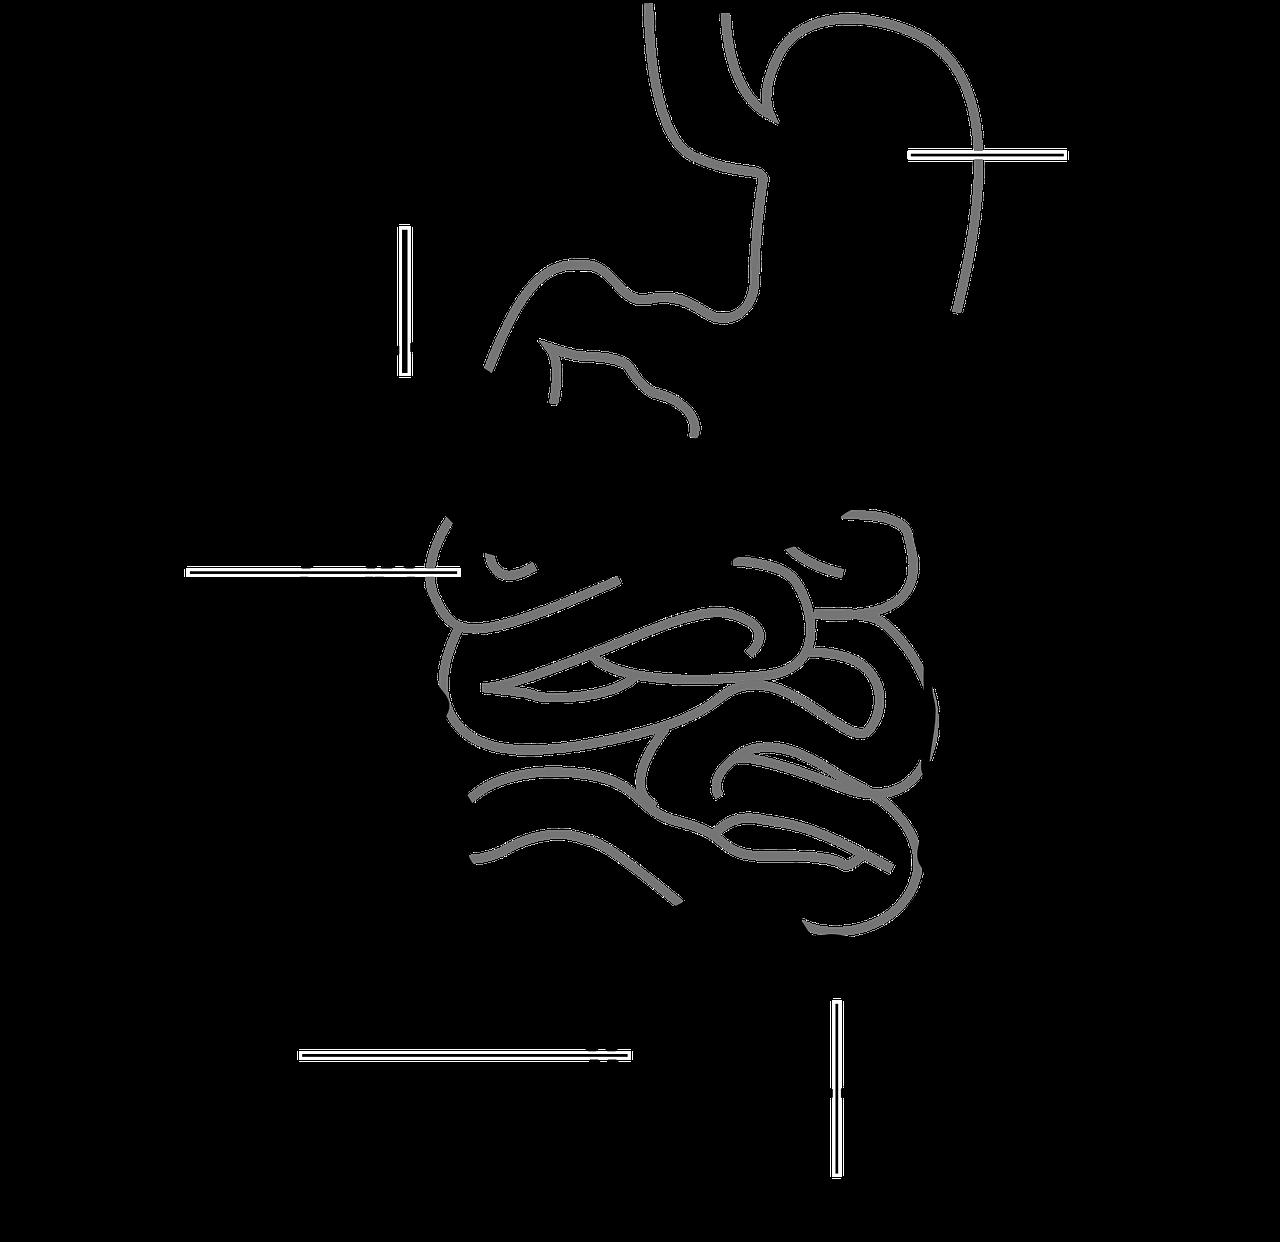 intestine chart